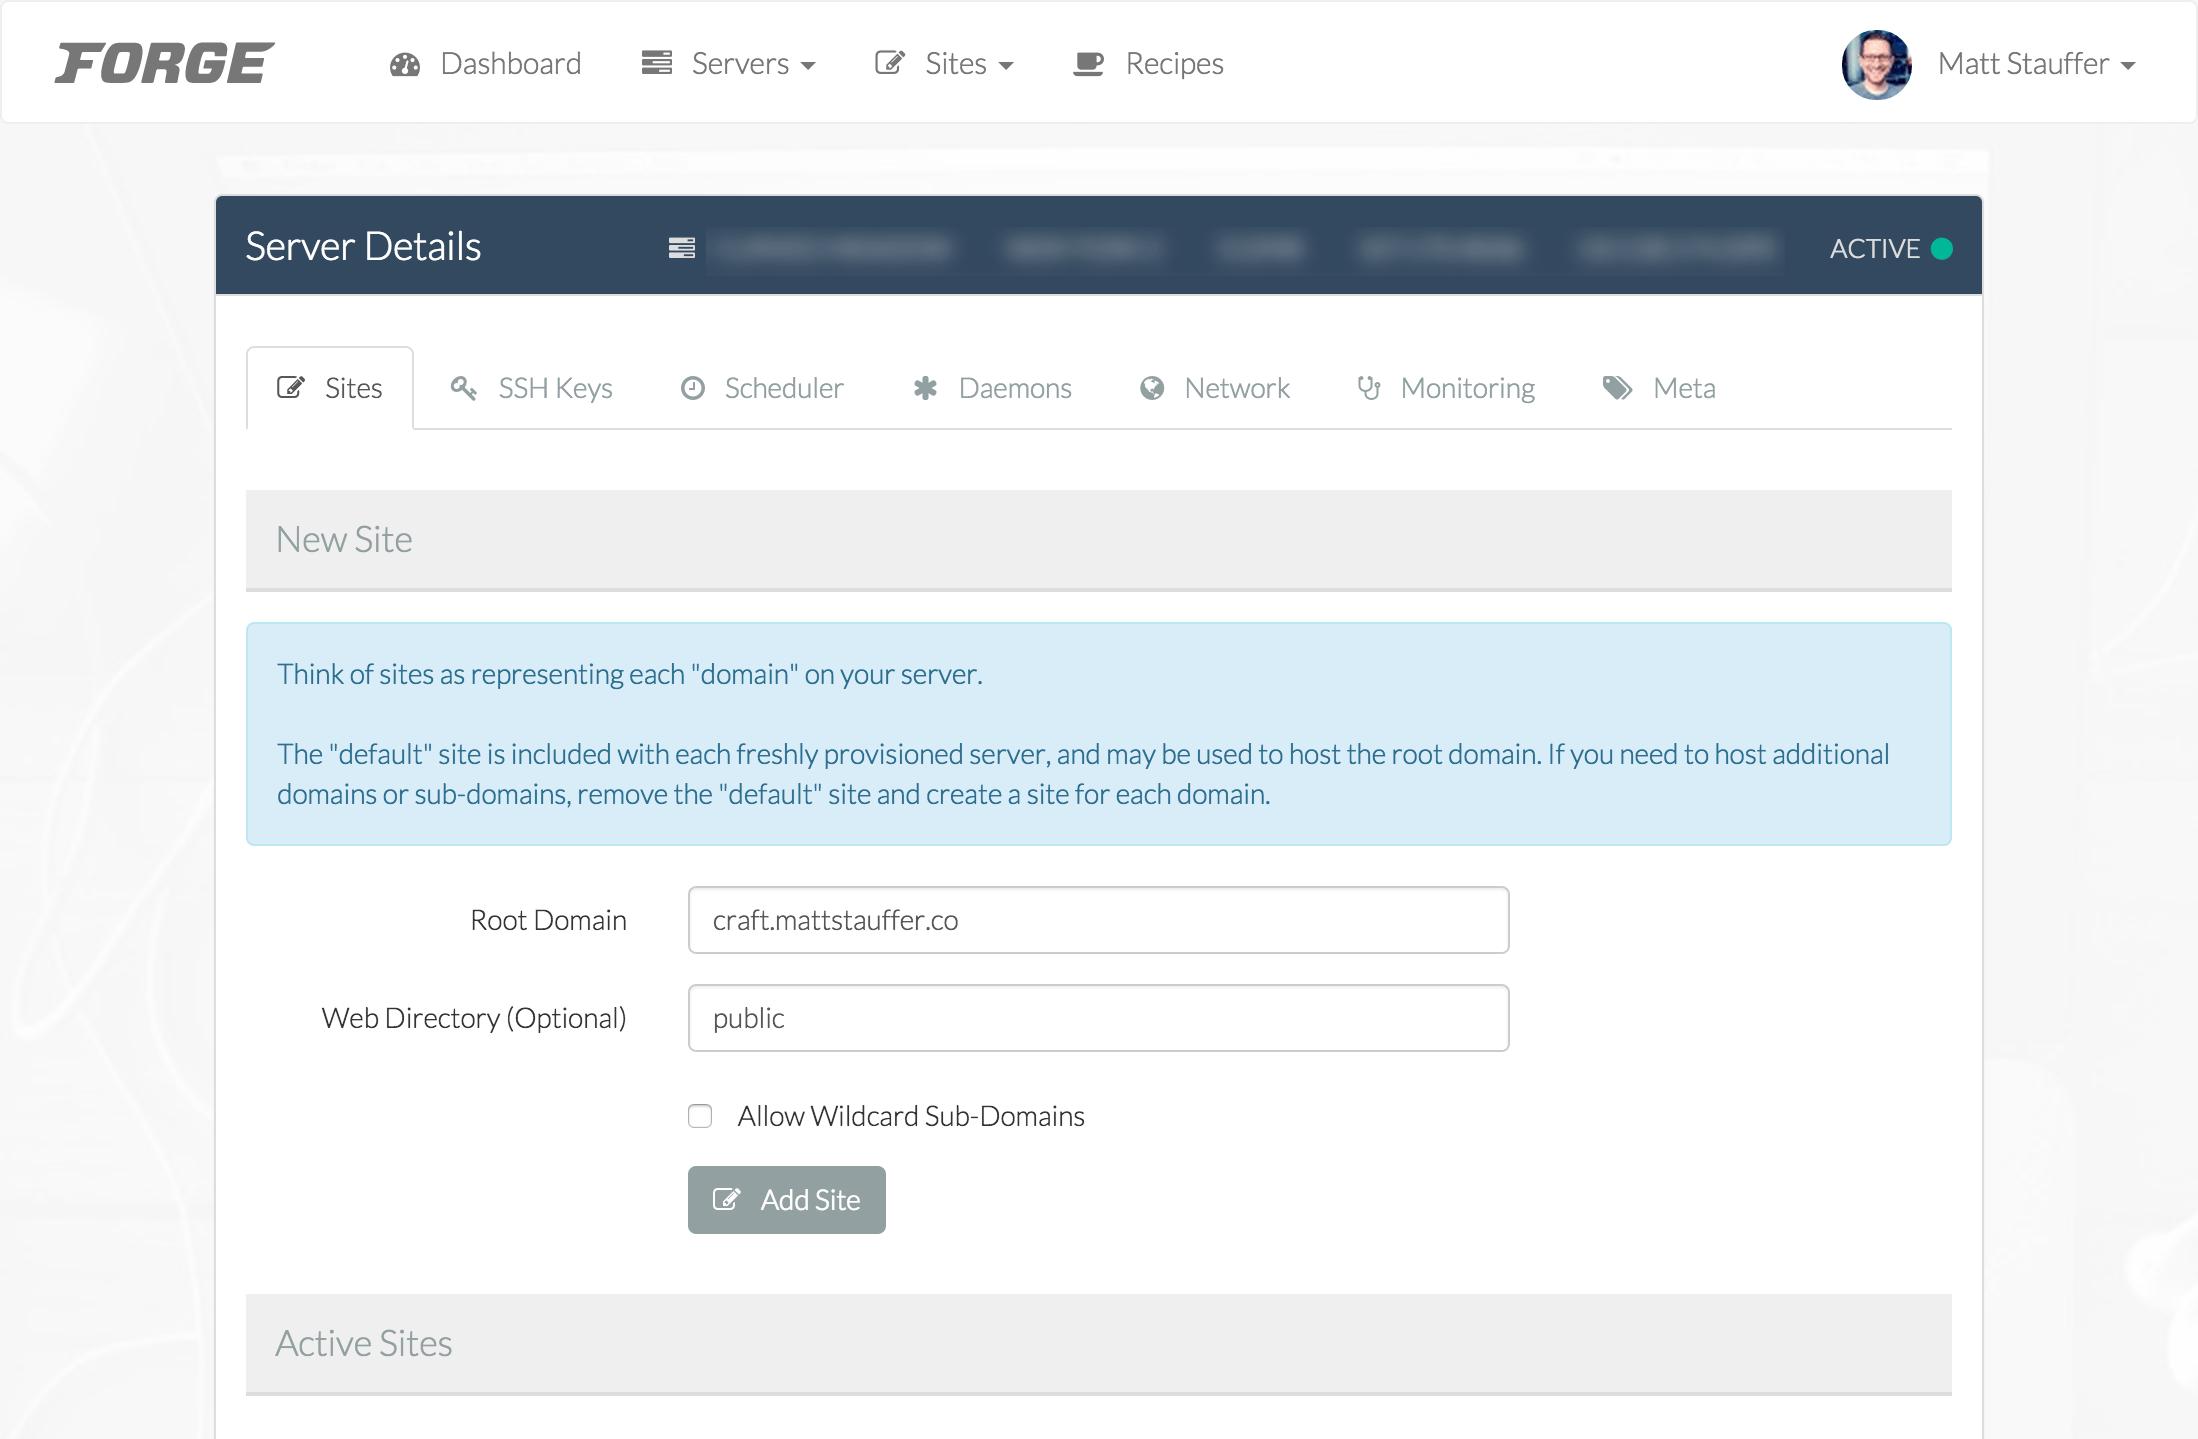 Add a new site